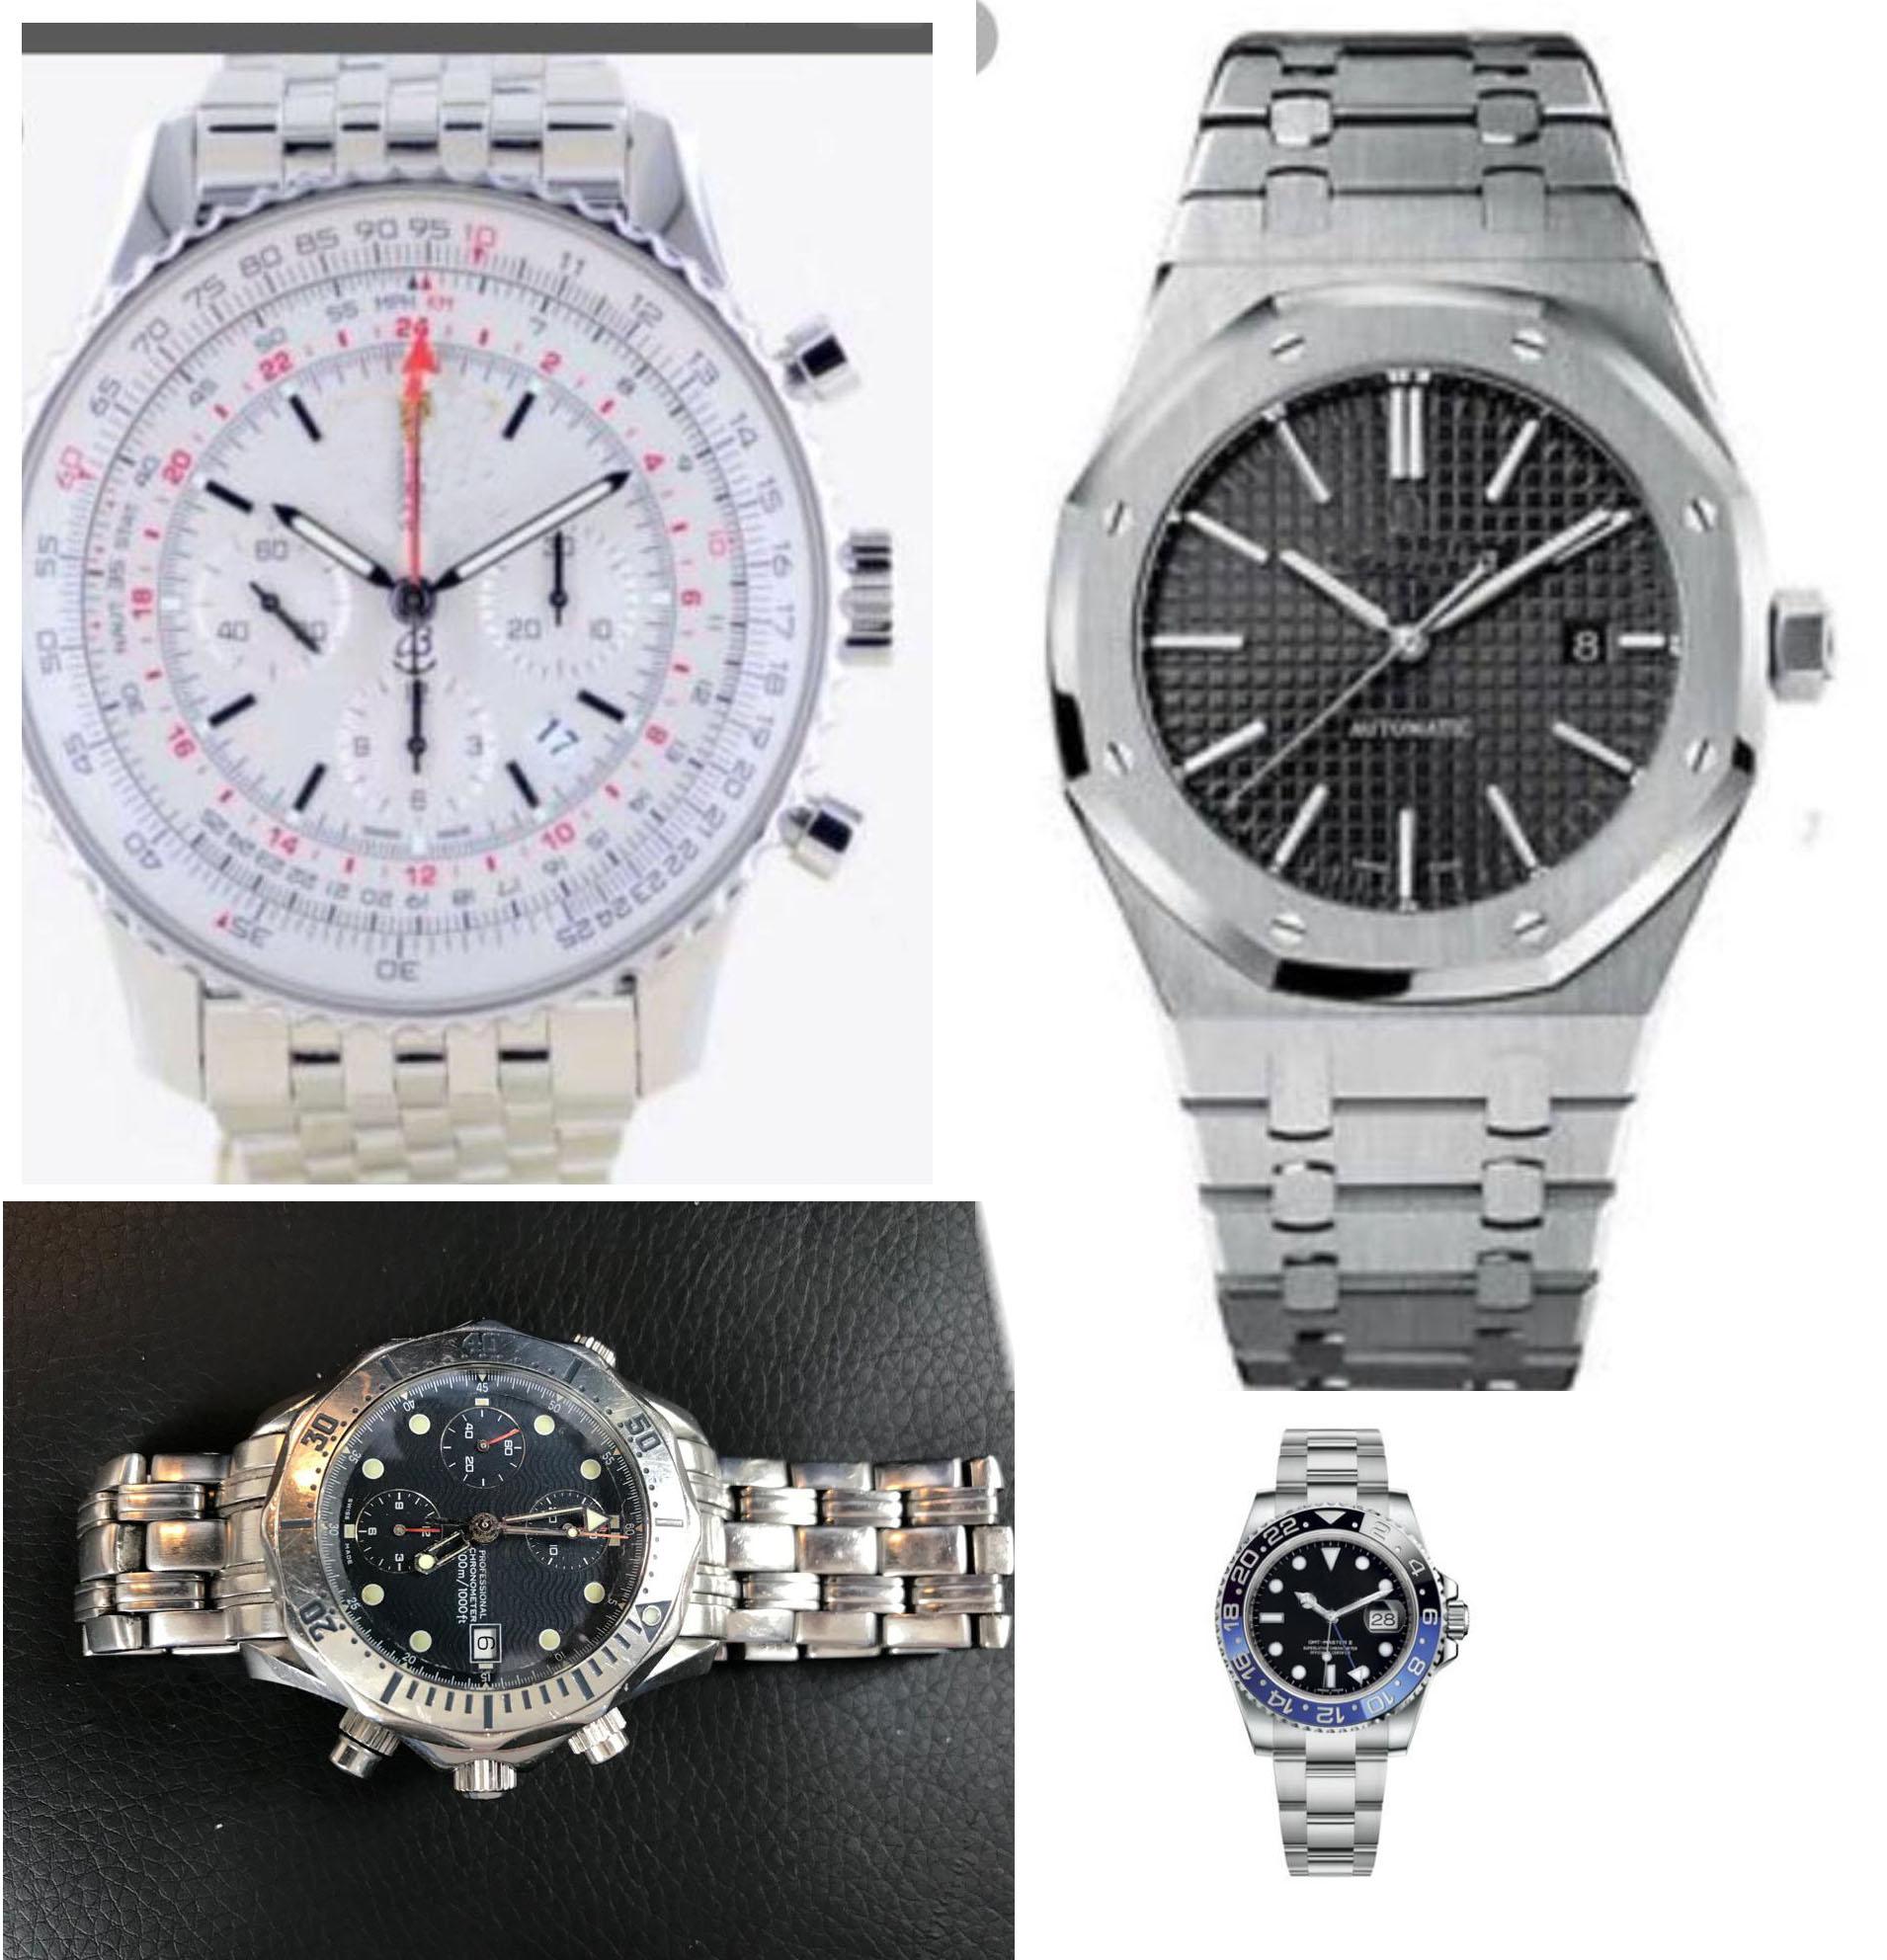 Luxury Brand New Quartz Chronograph Men GMT Watch Stopwatch Sapphire Stainless Steel WatchesLuxury Brand New Quartz Chronograph Men GMT Watch Stopwatch Sapphire Stainless Steel Watches